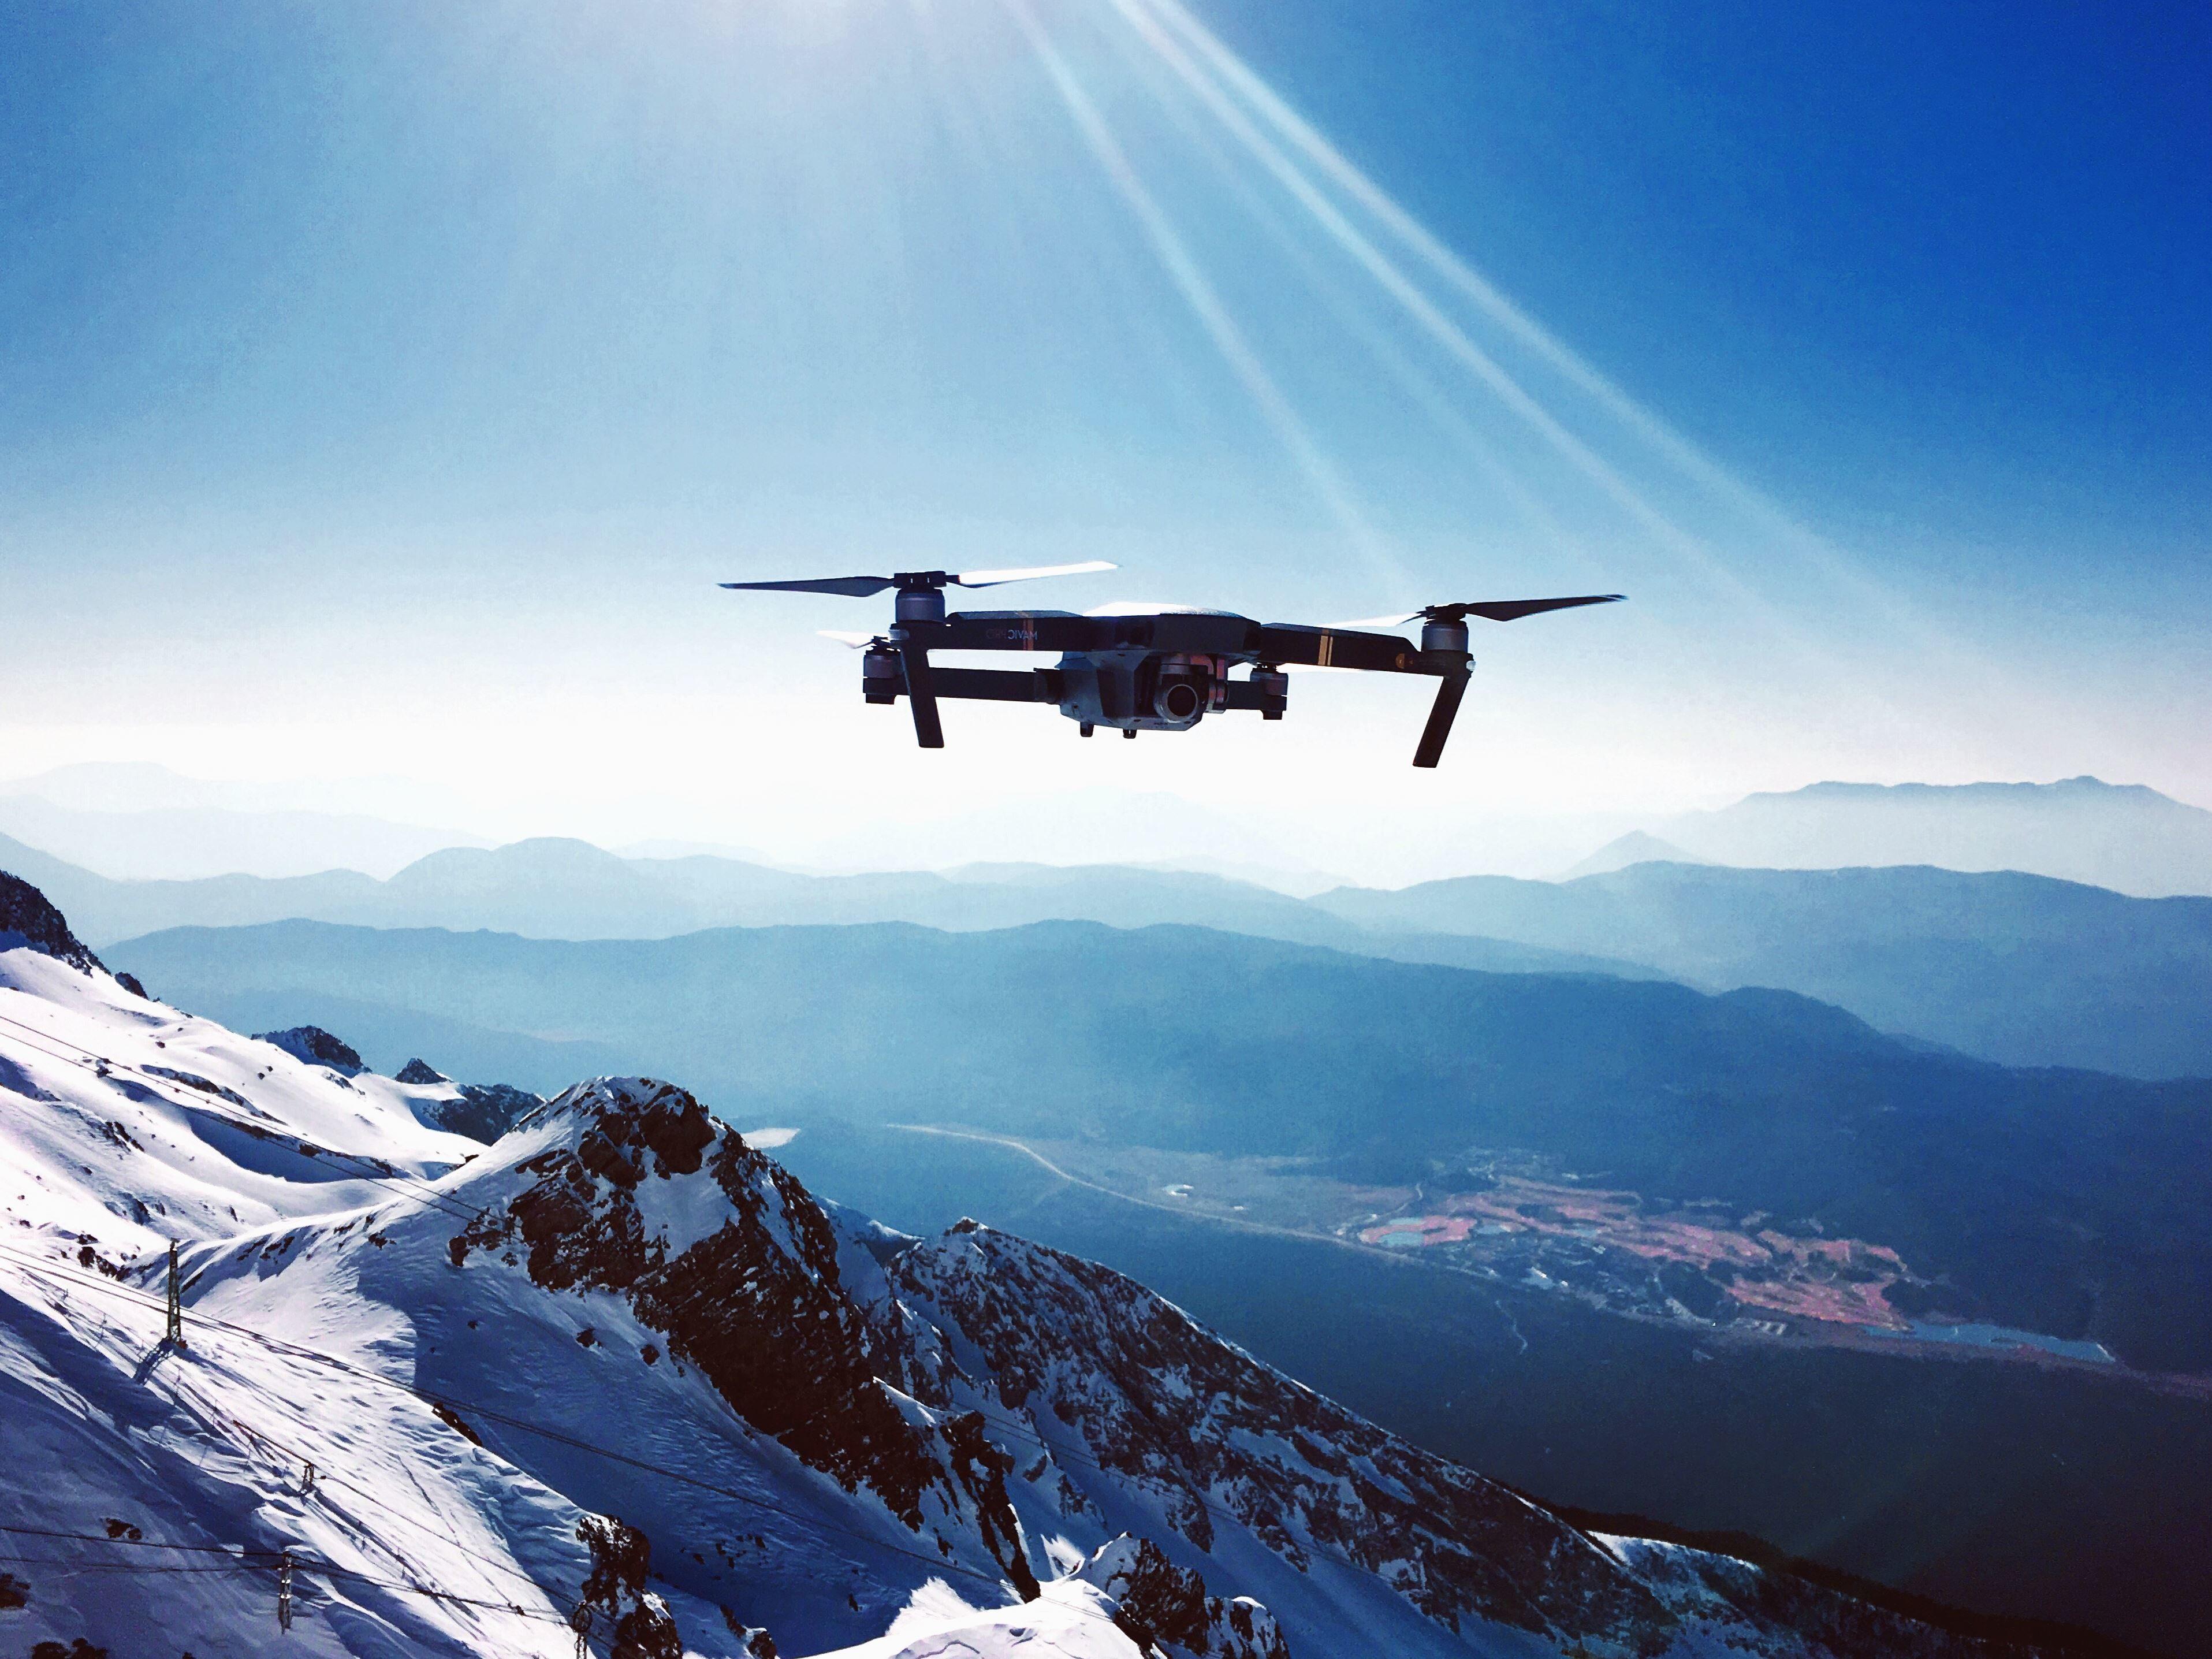 Iphone Wallpaper Resolution Image Libre Drone Avion Vol Ciel Montagne Vall 233 E Neige